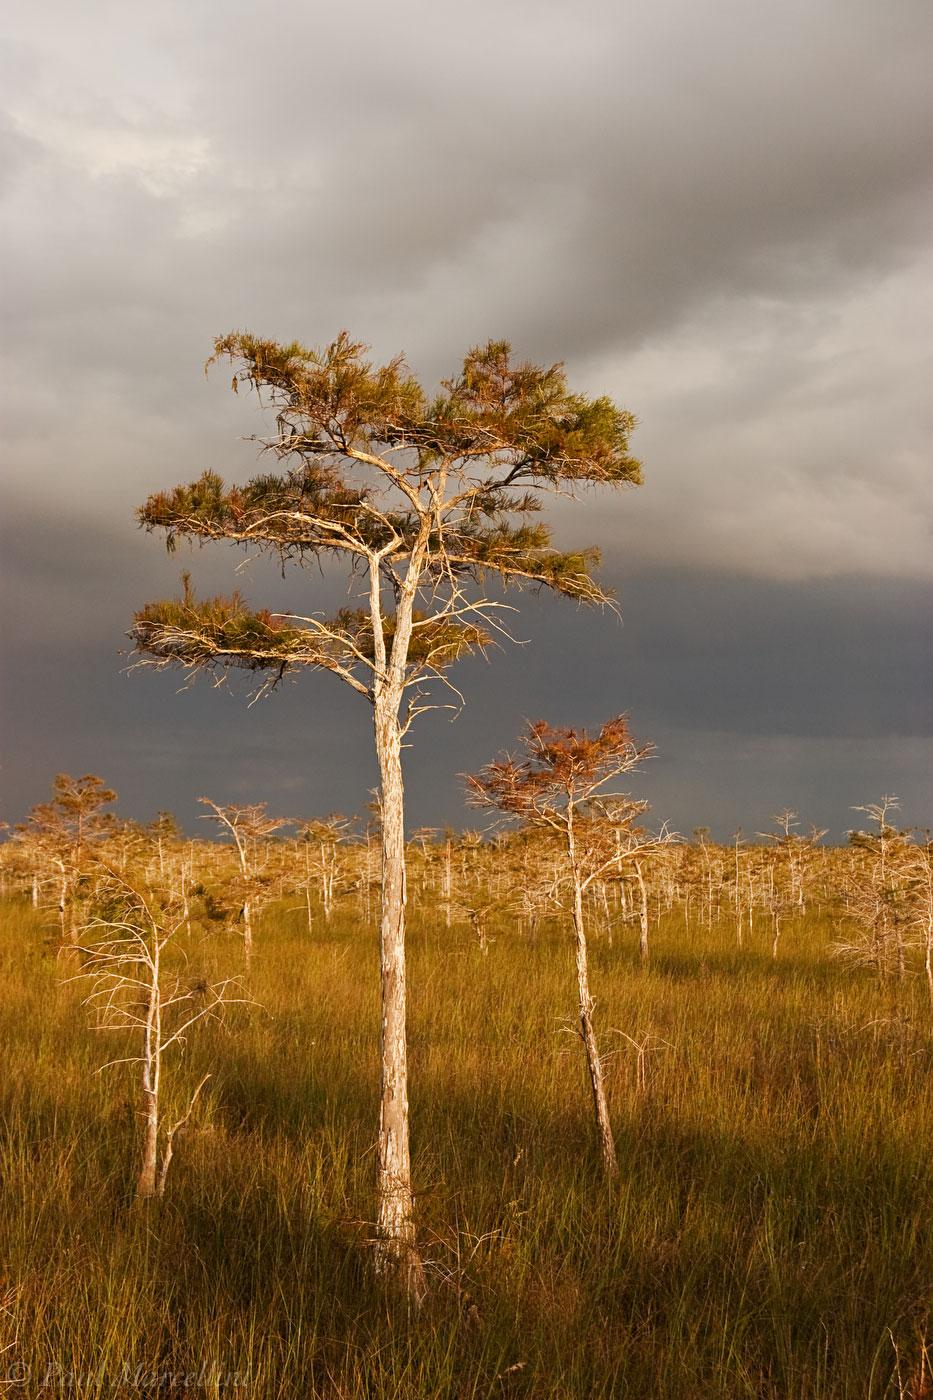 dwarf cypress, everglades, storm, Florida, nature, photography, florida national parks, photo